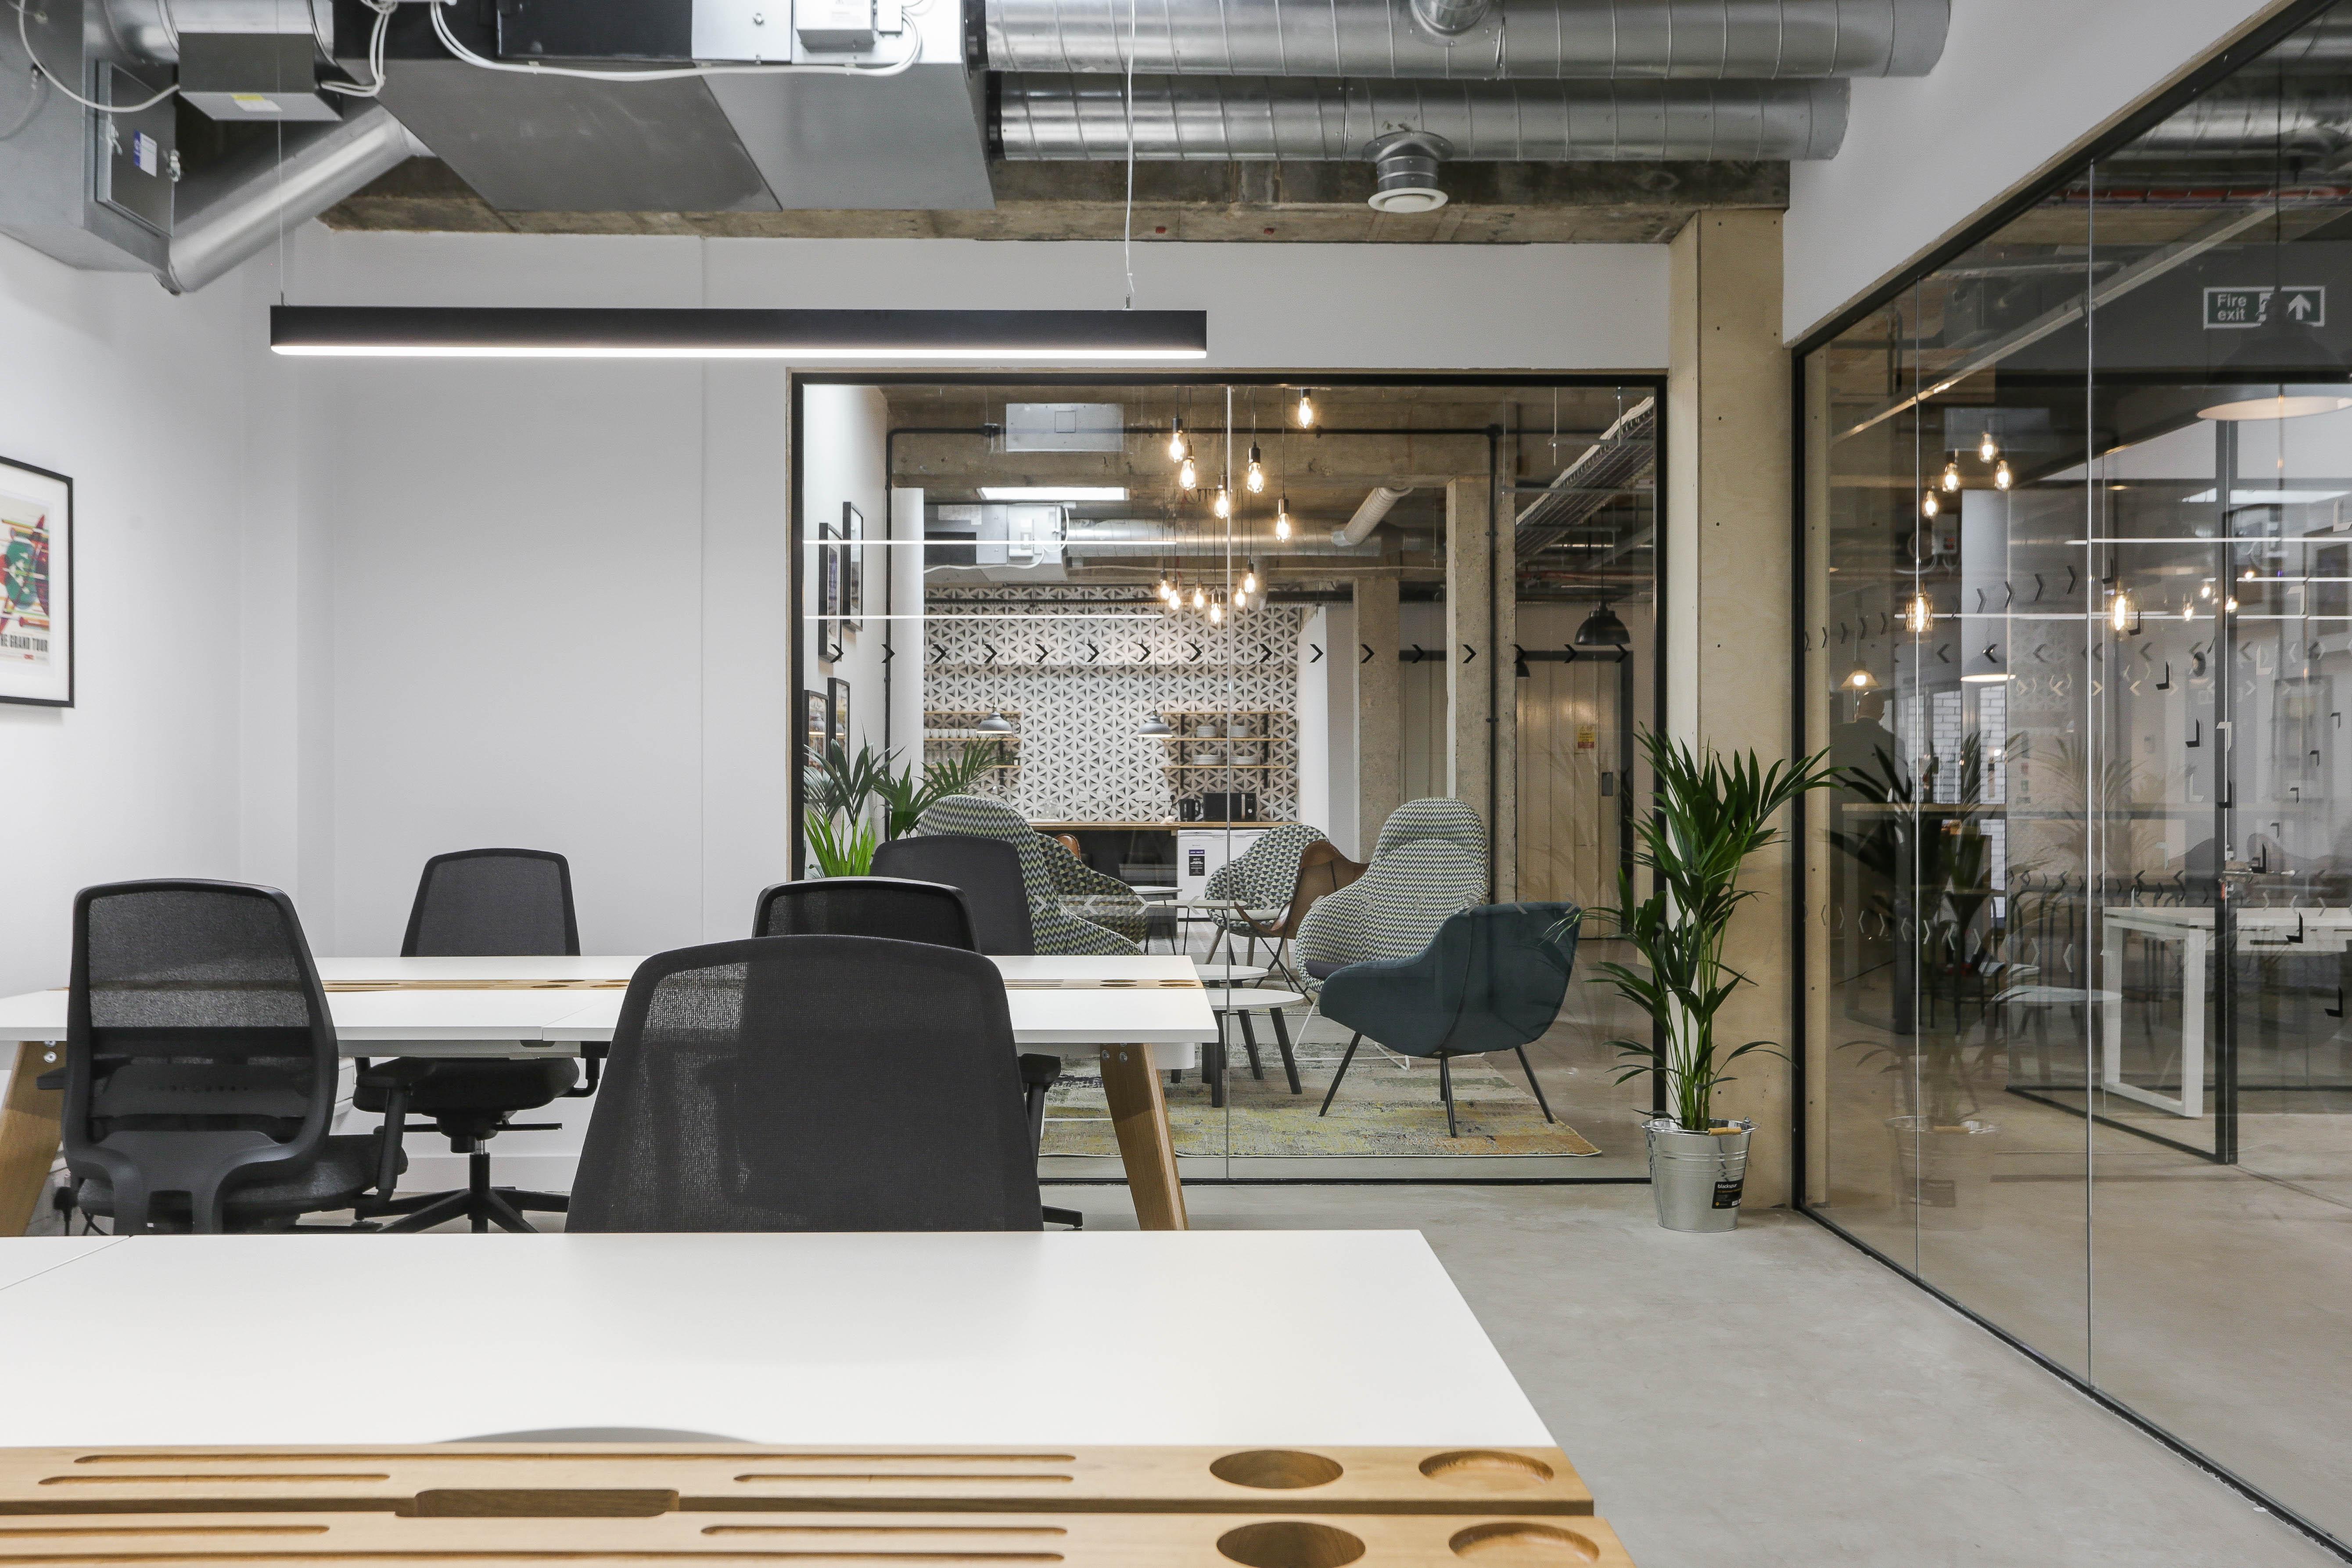 10 person workspace